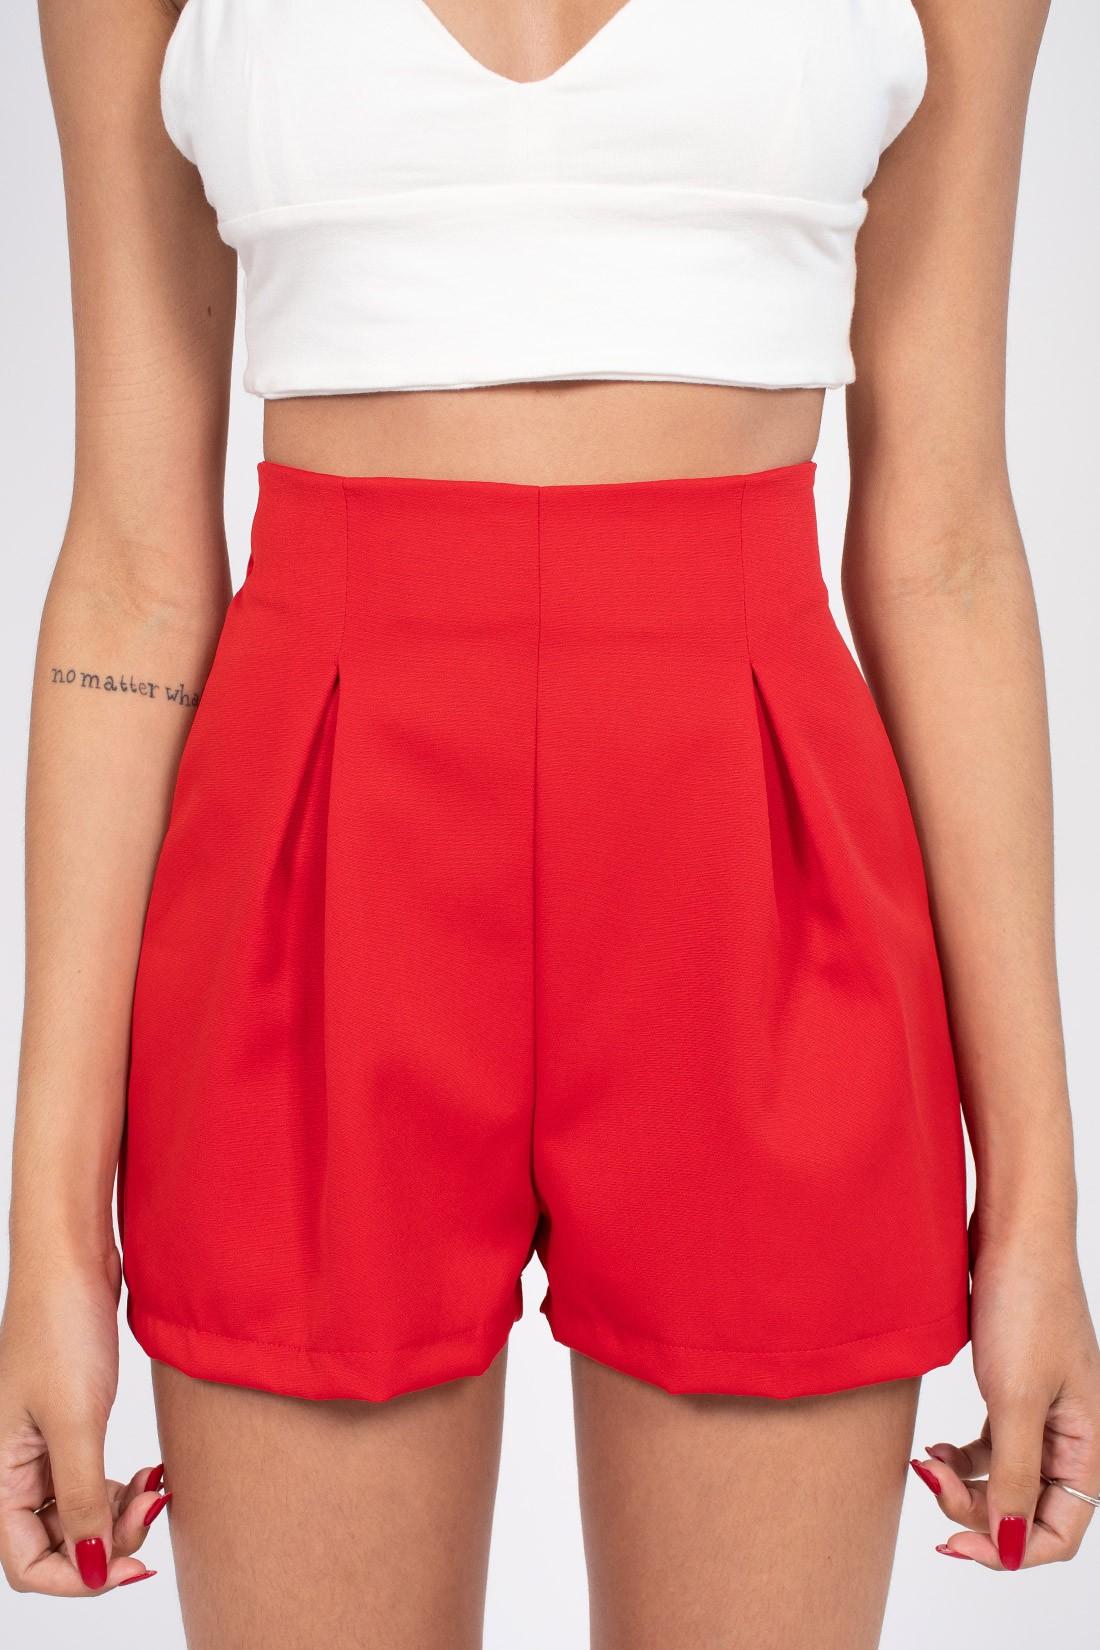 Shorts Colcci Joana